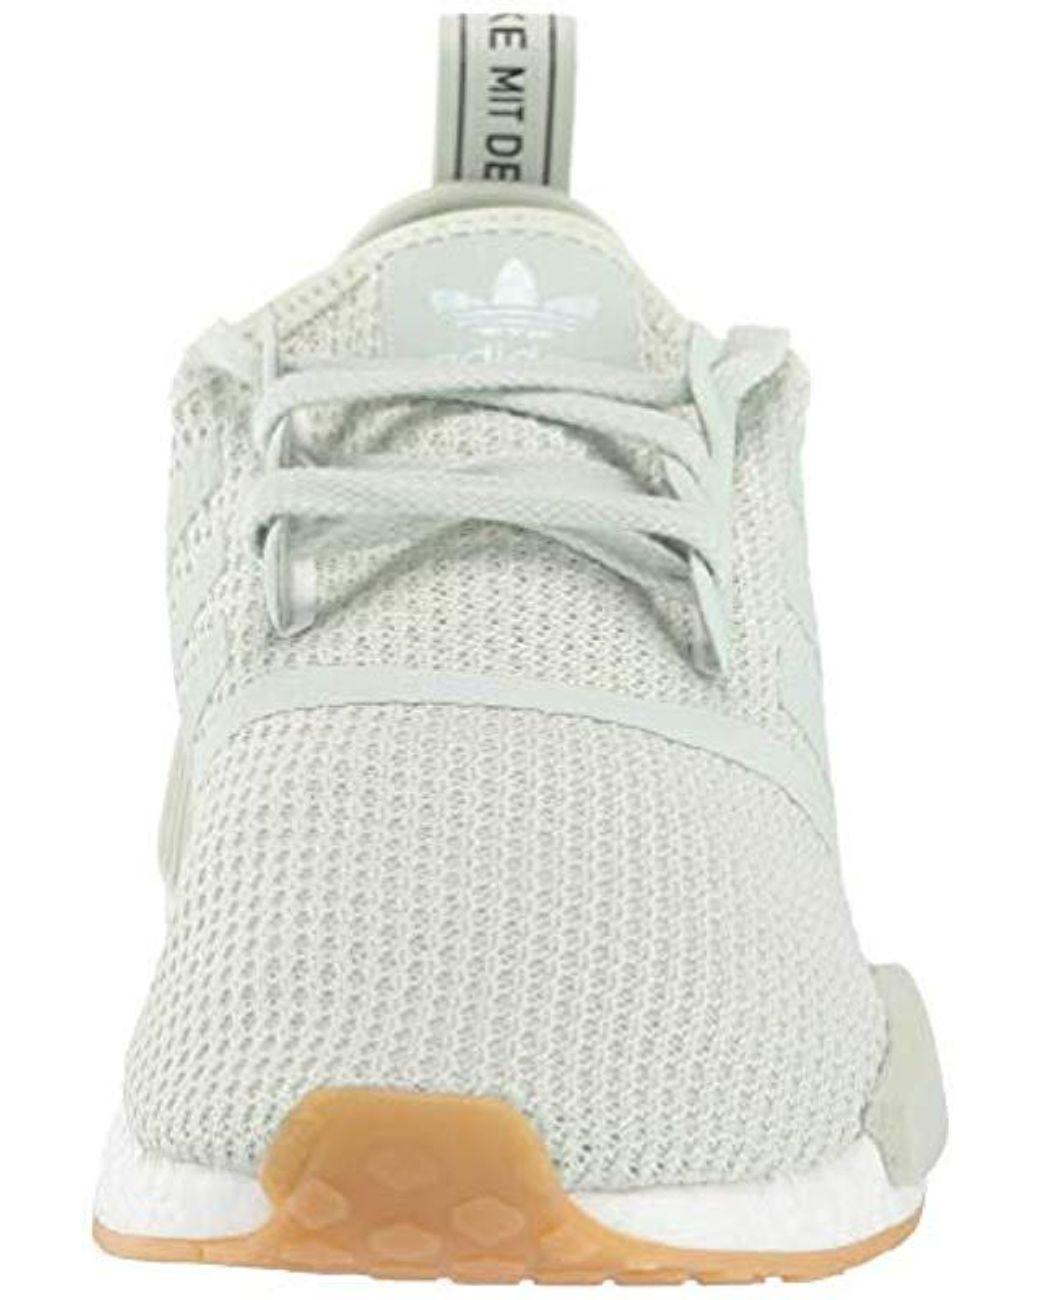 4ffcb1b013fe9 Men's Green Nmd_r1 Running Shoe